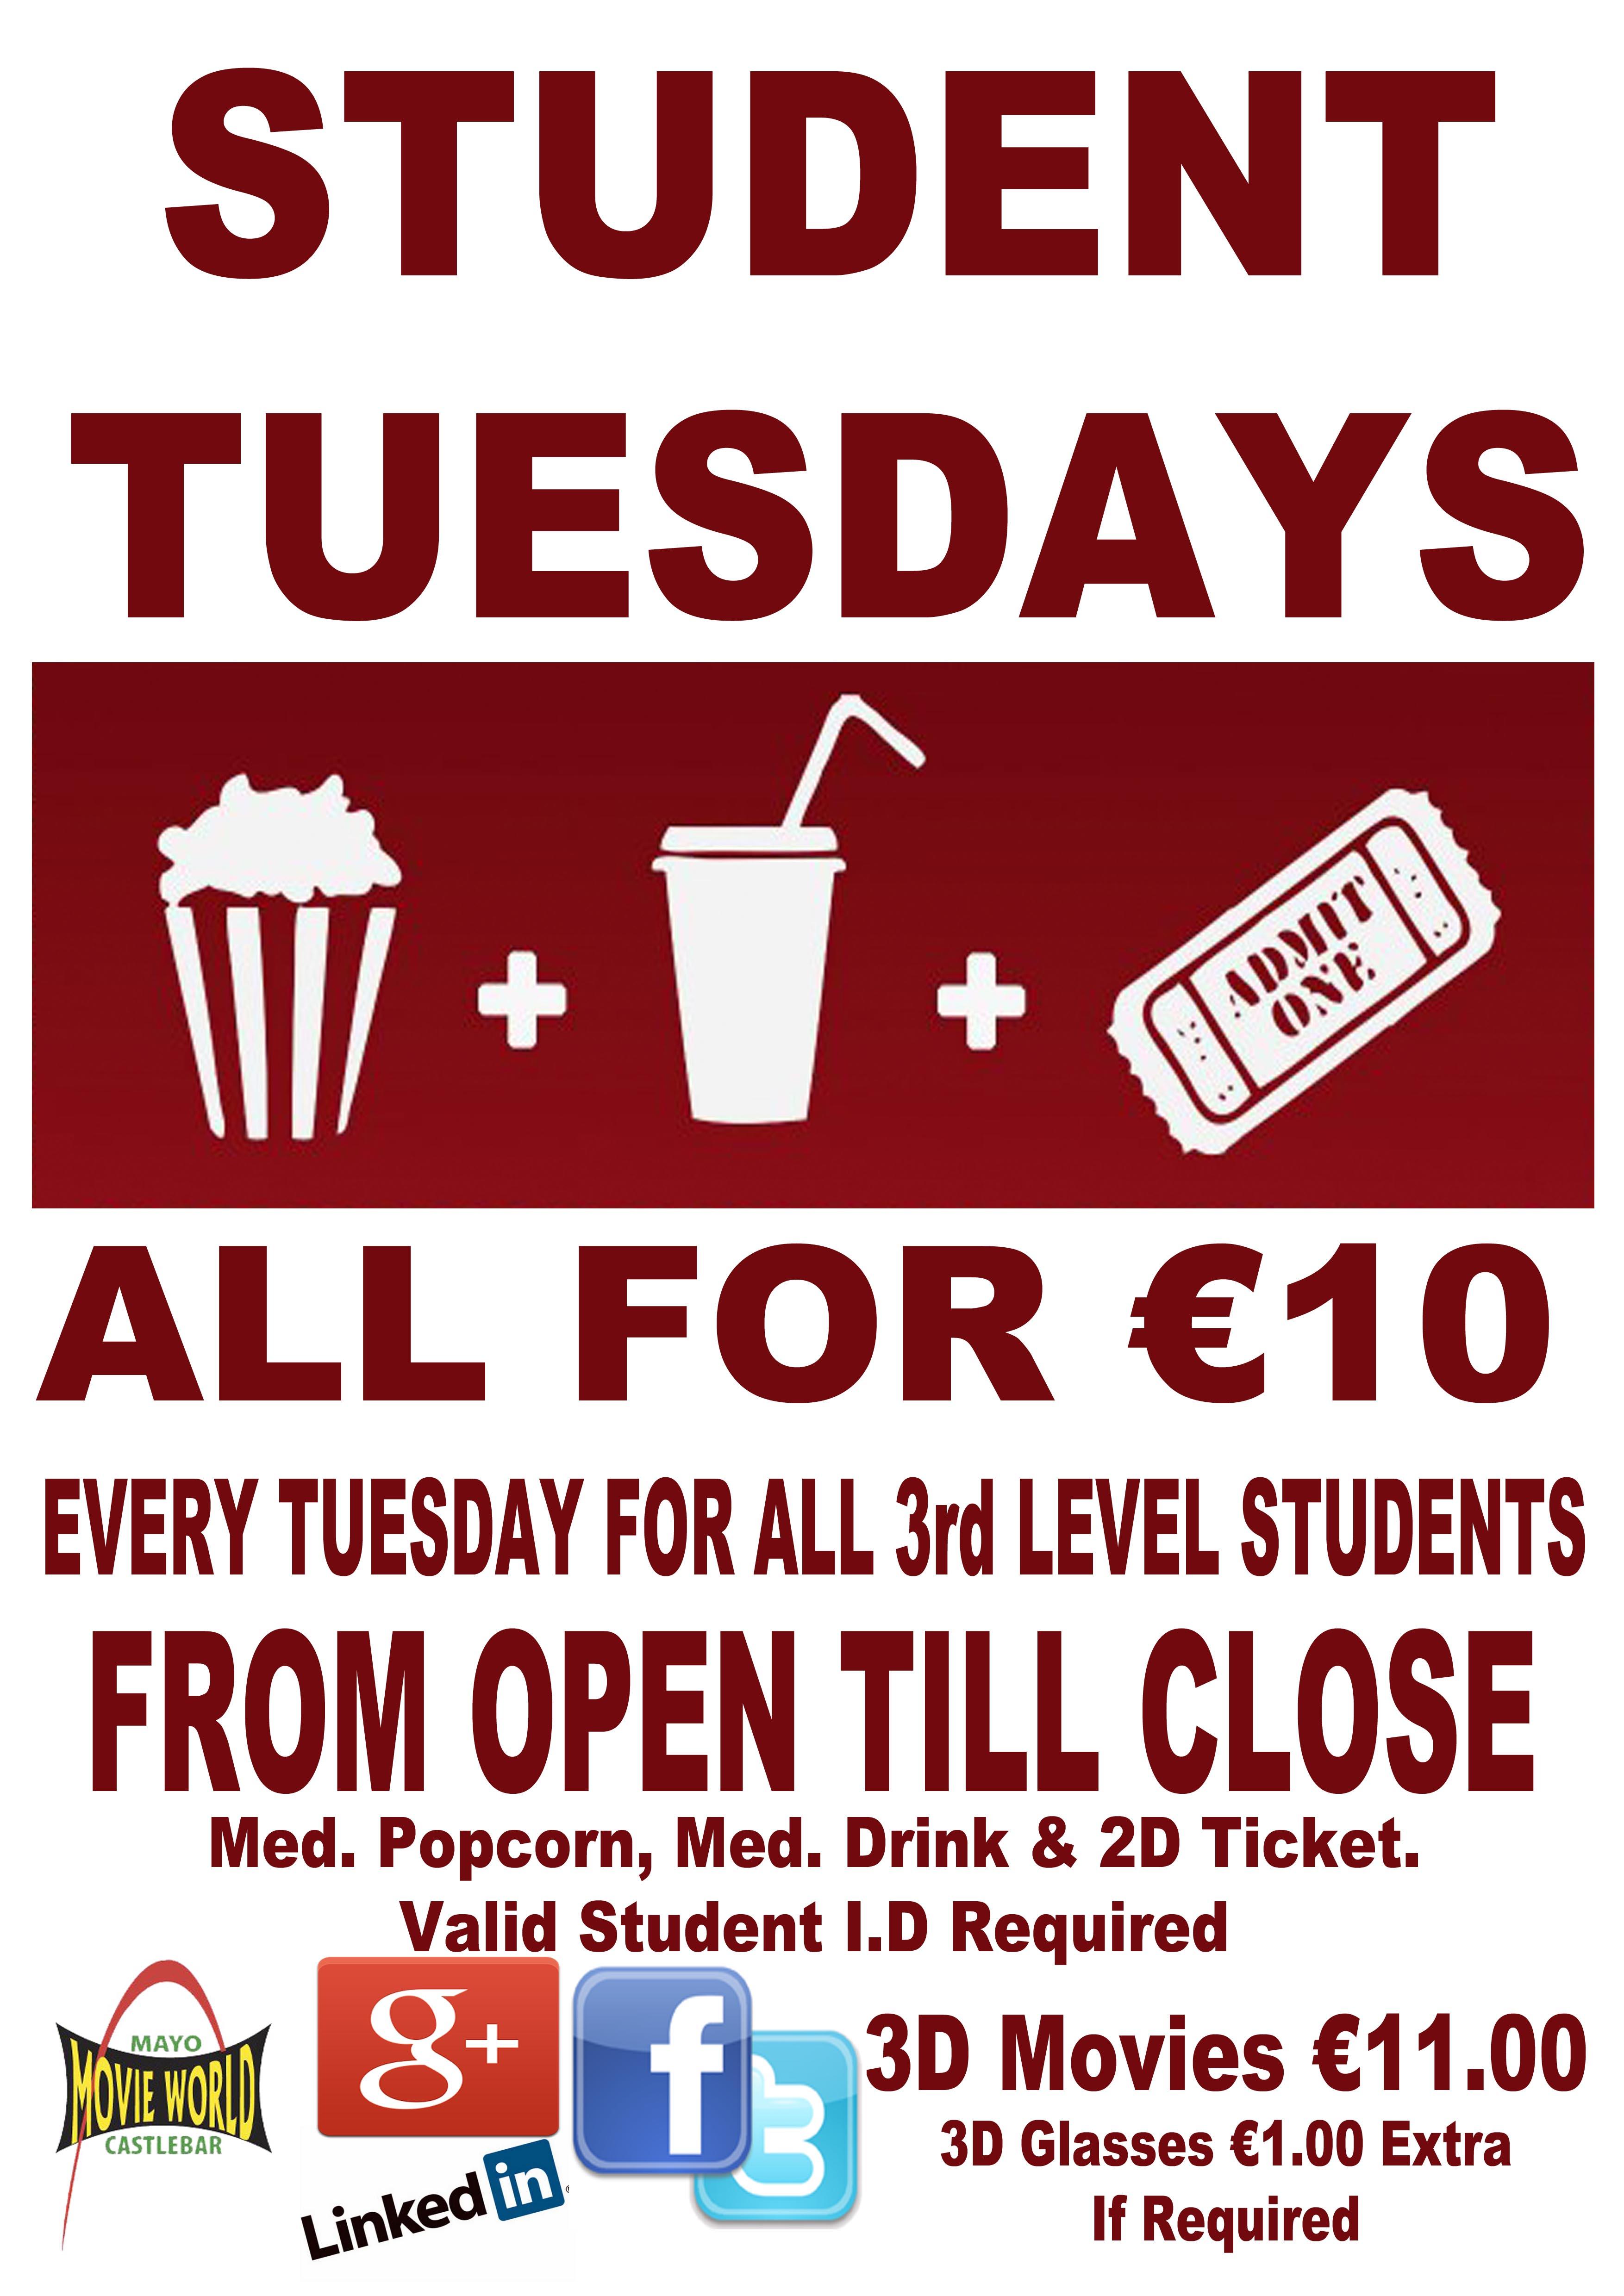 Student_Tuesday_12.jpg